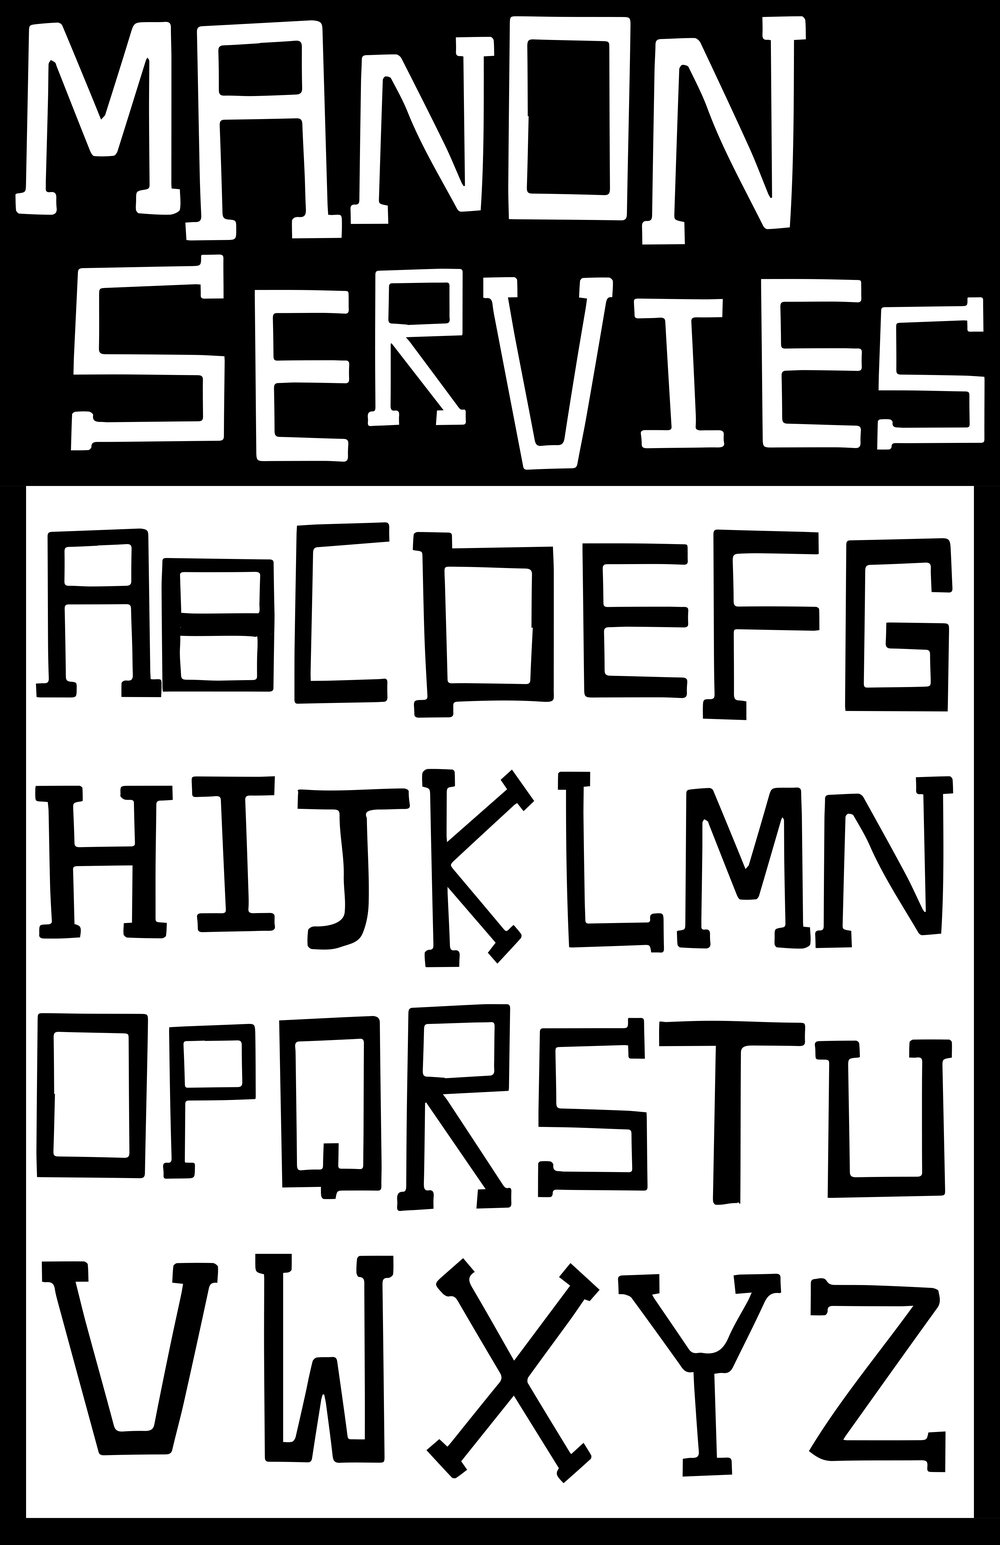 MANON font_1.jpg